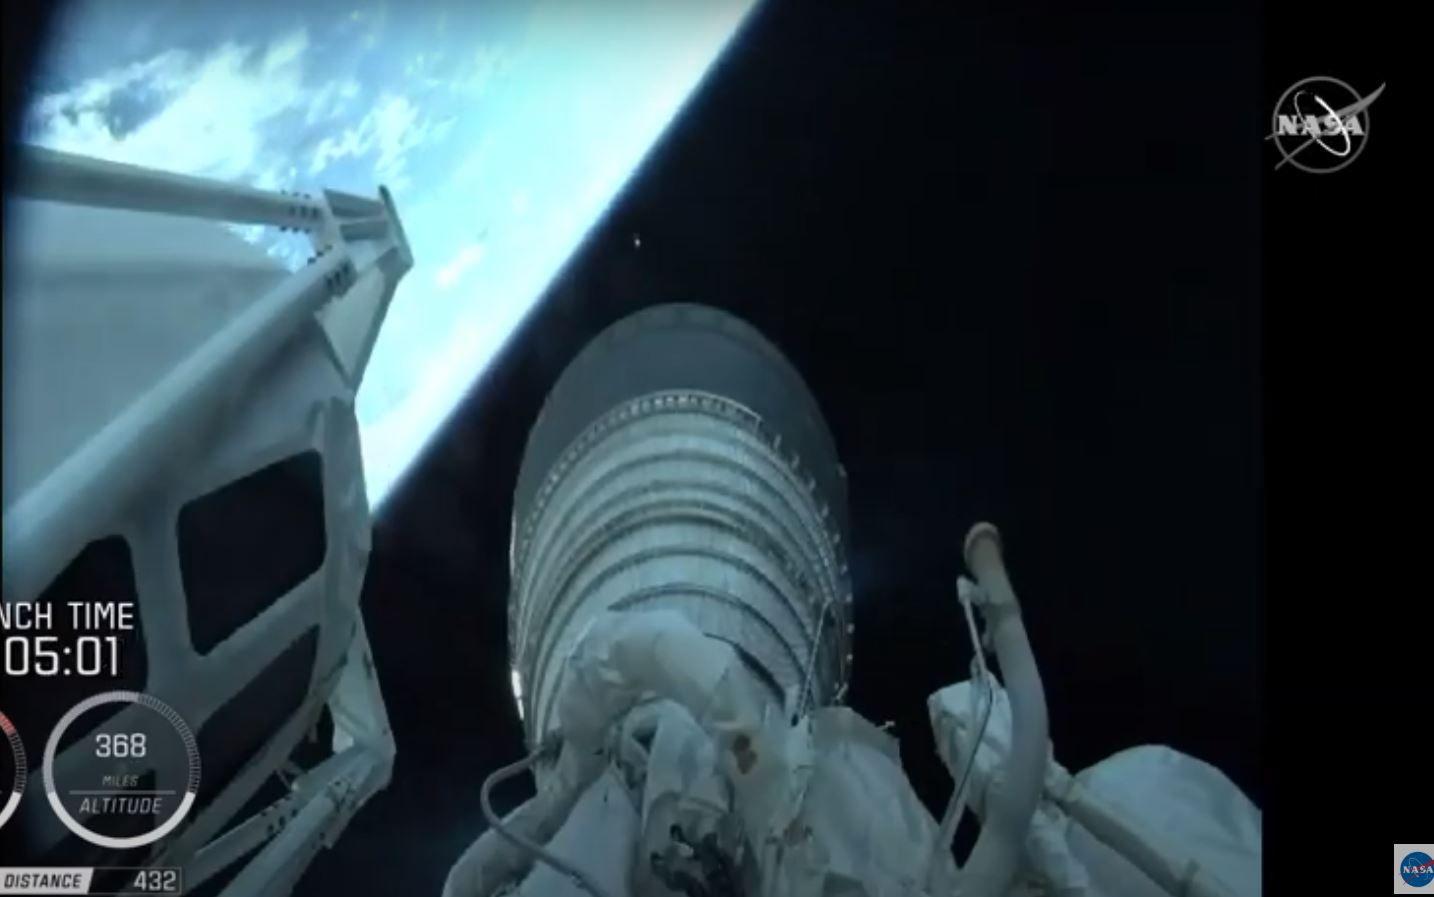 US-SPACE-MARS-PESEVERANCE